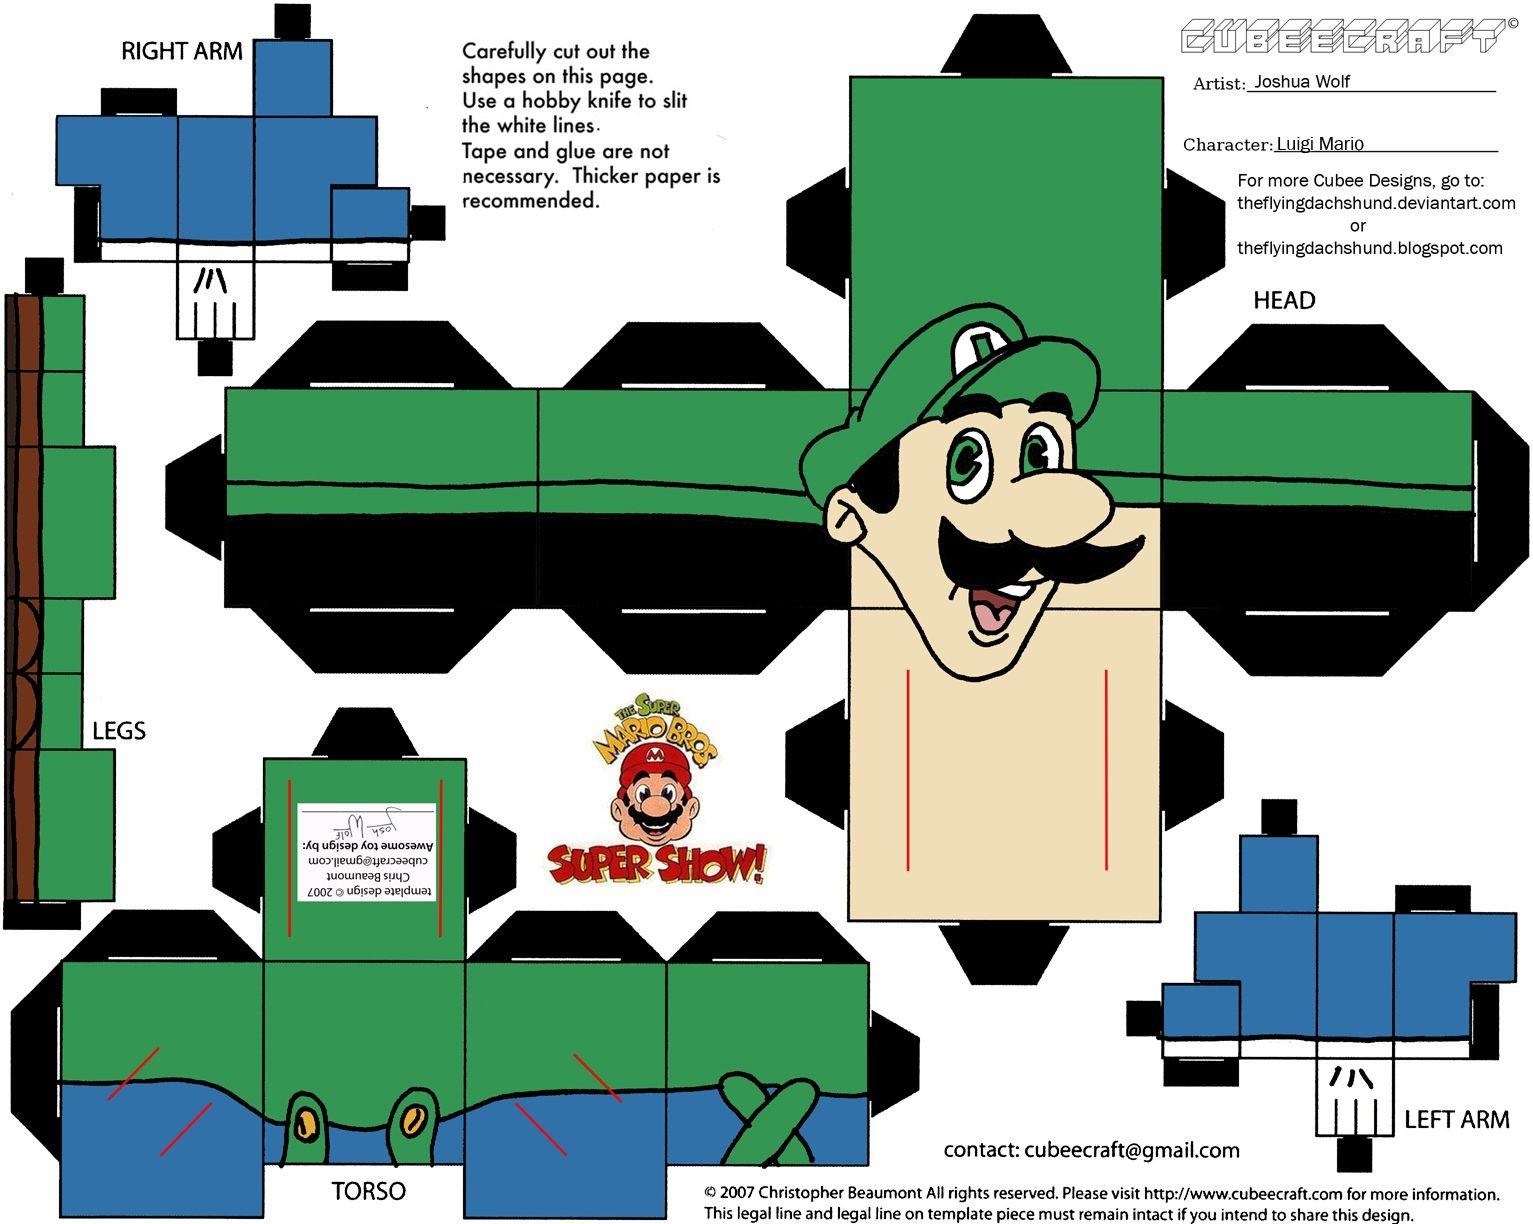 Papercraft Luigi Vg 3 Luigi Cubee by theflyingdachshund On Deviantart